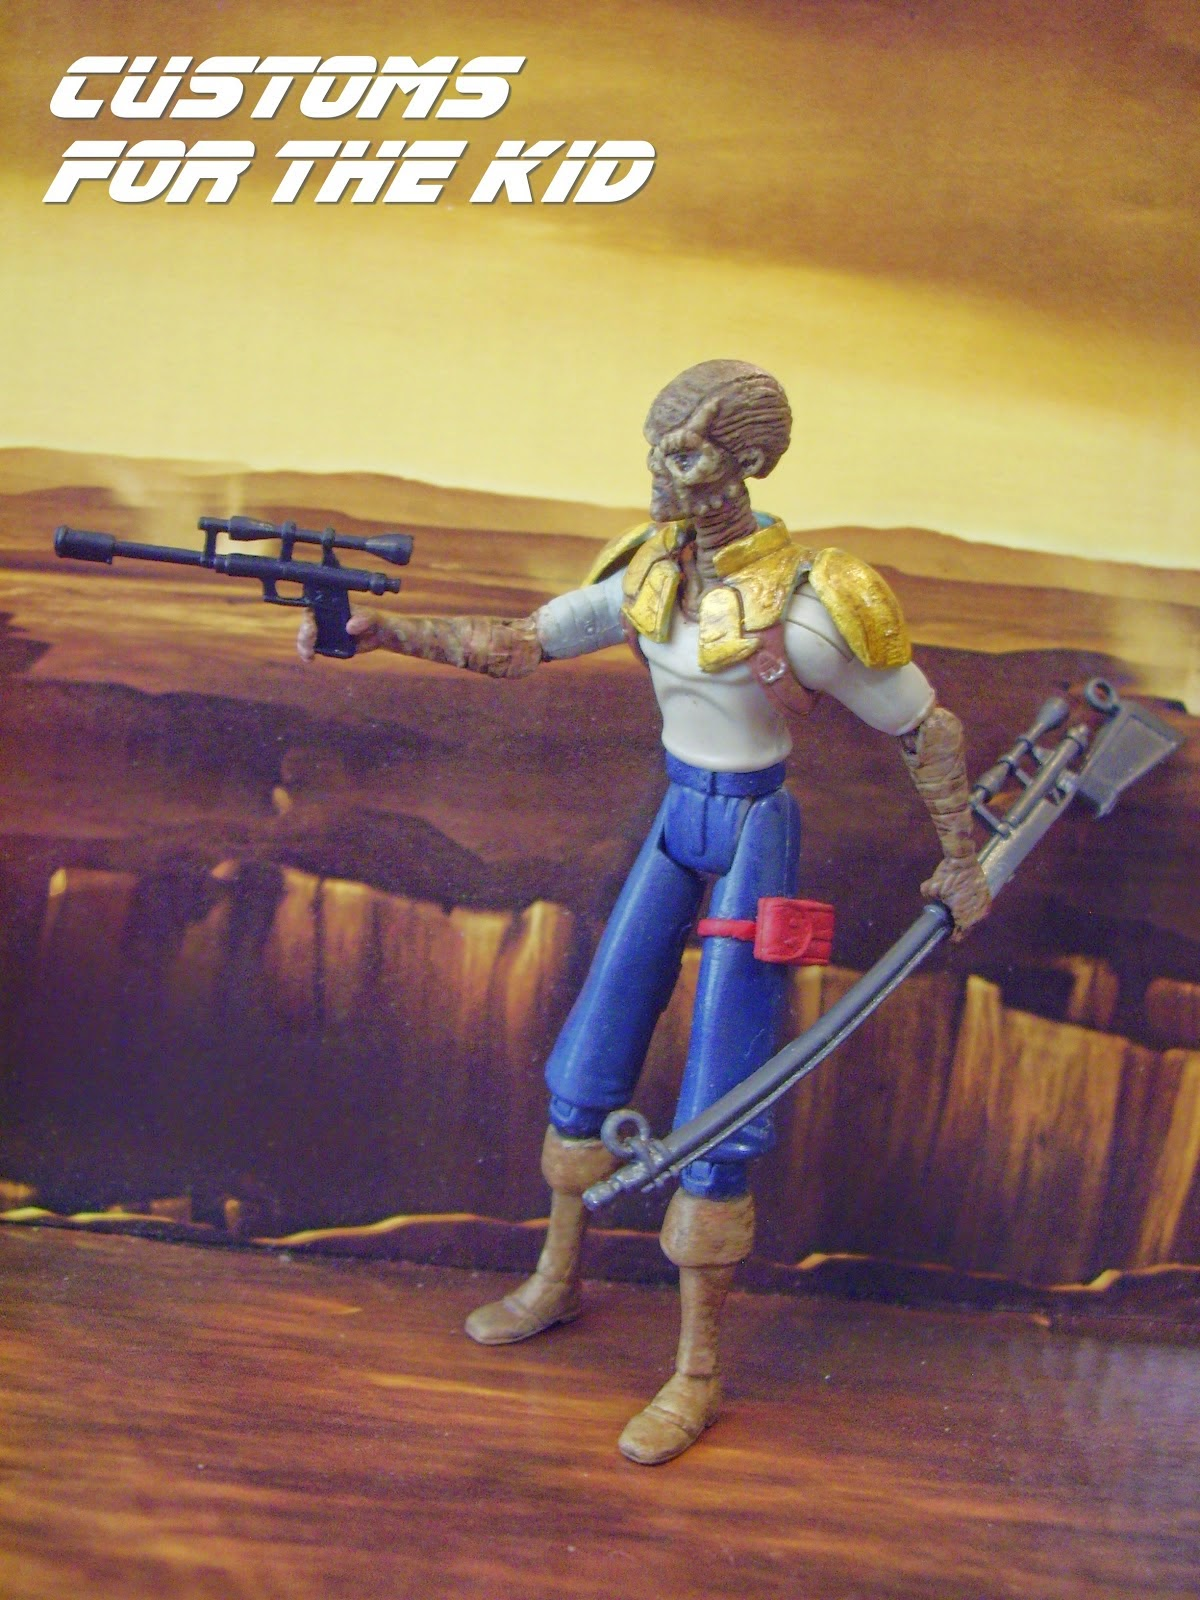 http://customsforthekid.blogspot.com/2014/08/clone-wars-weequay-pirate-created-by.html